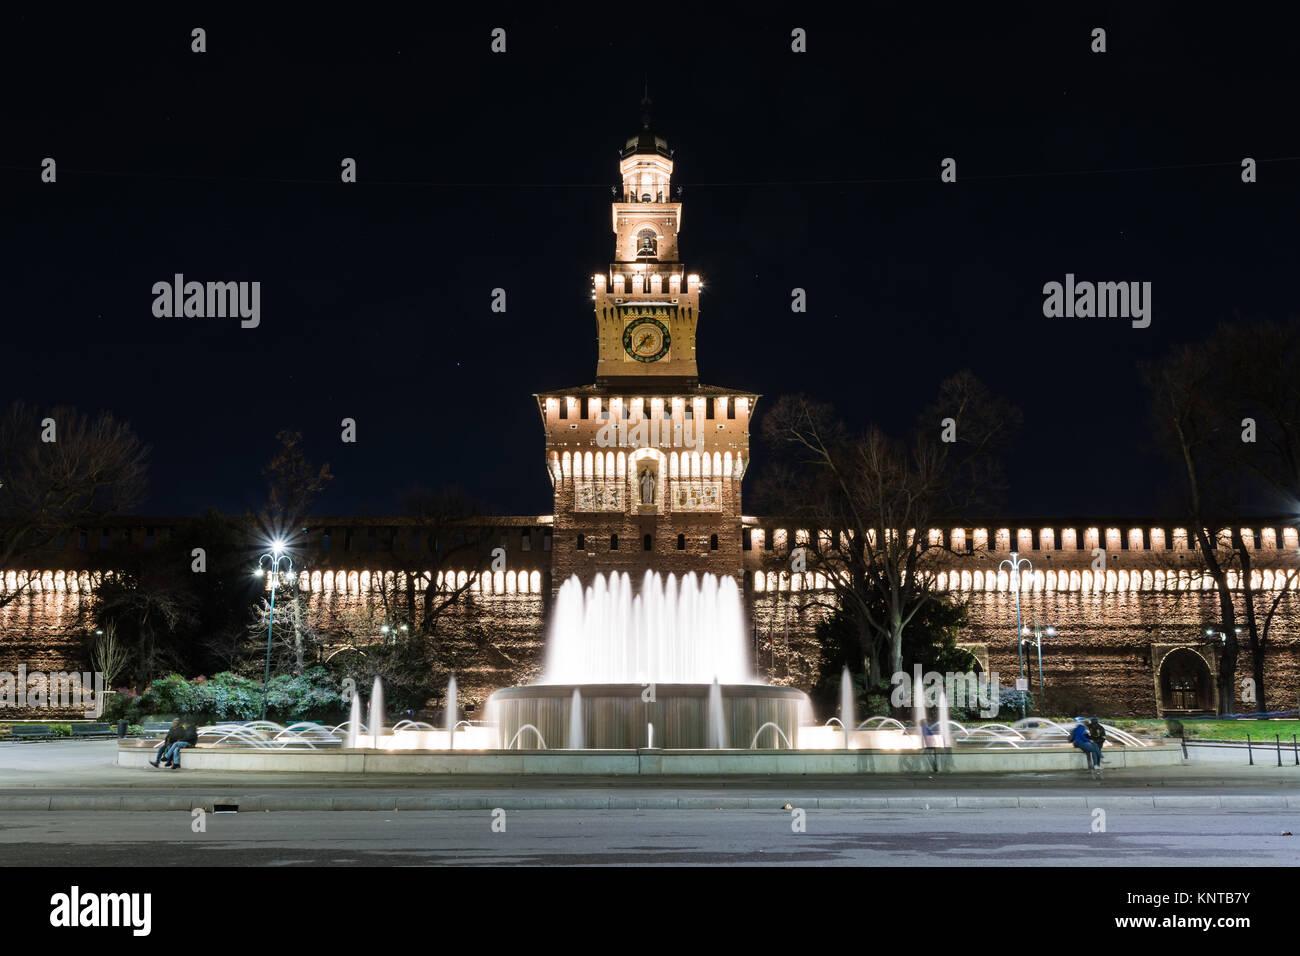 Castello sforzesco mailand italien denkmal for Architektur mailand